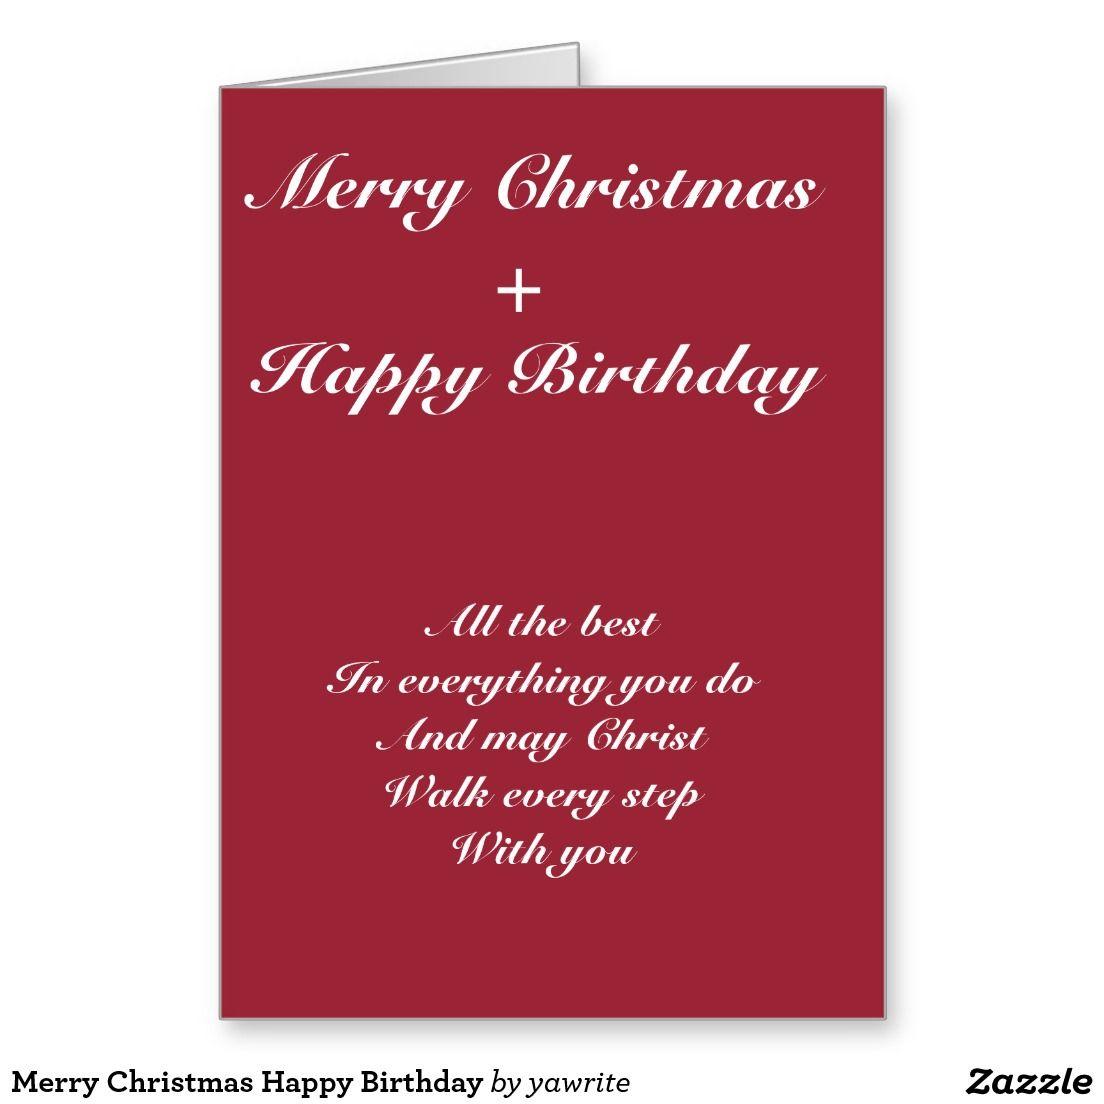 Merry Christmas Happy Birthday Holiday Card Zazzle Com Happy Birthday Cards Happy Birthday Greetings Happy Birthday Greeting Card